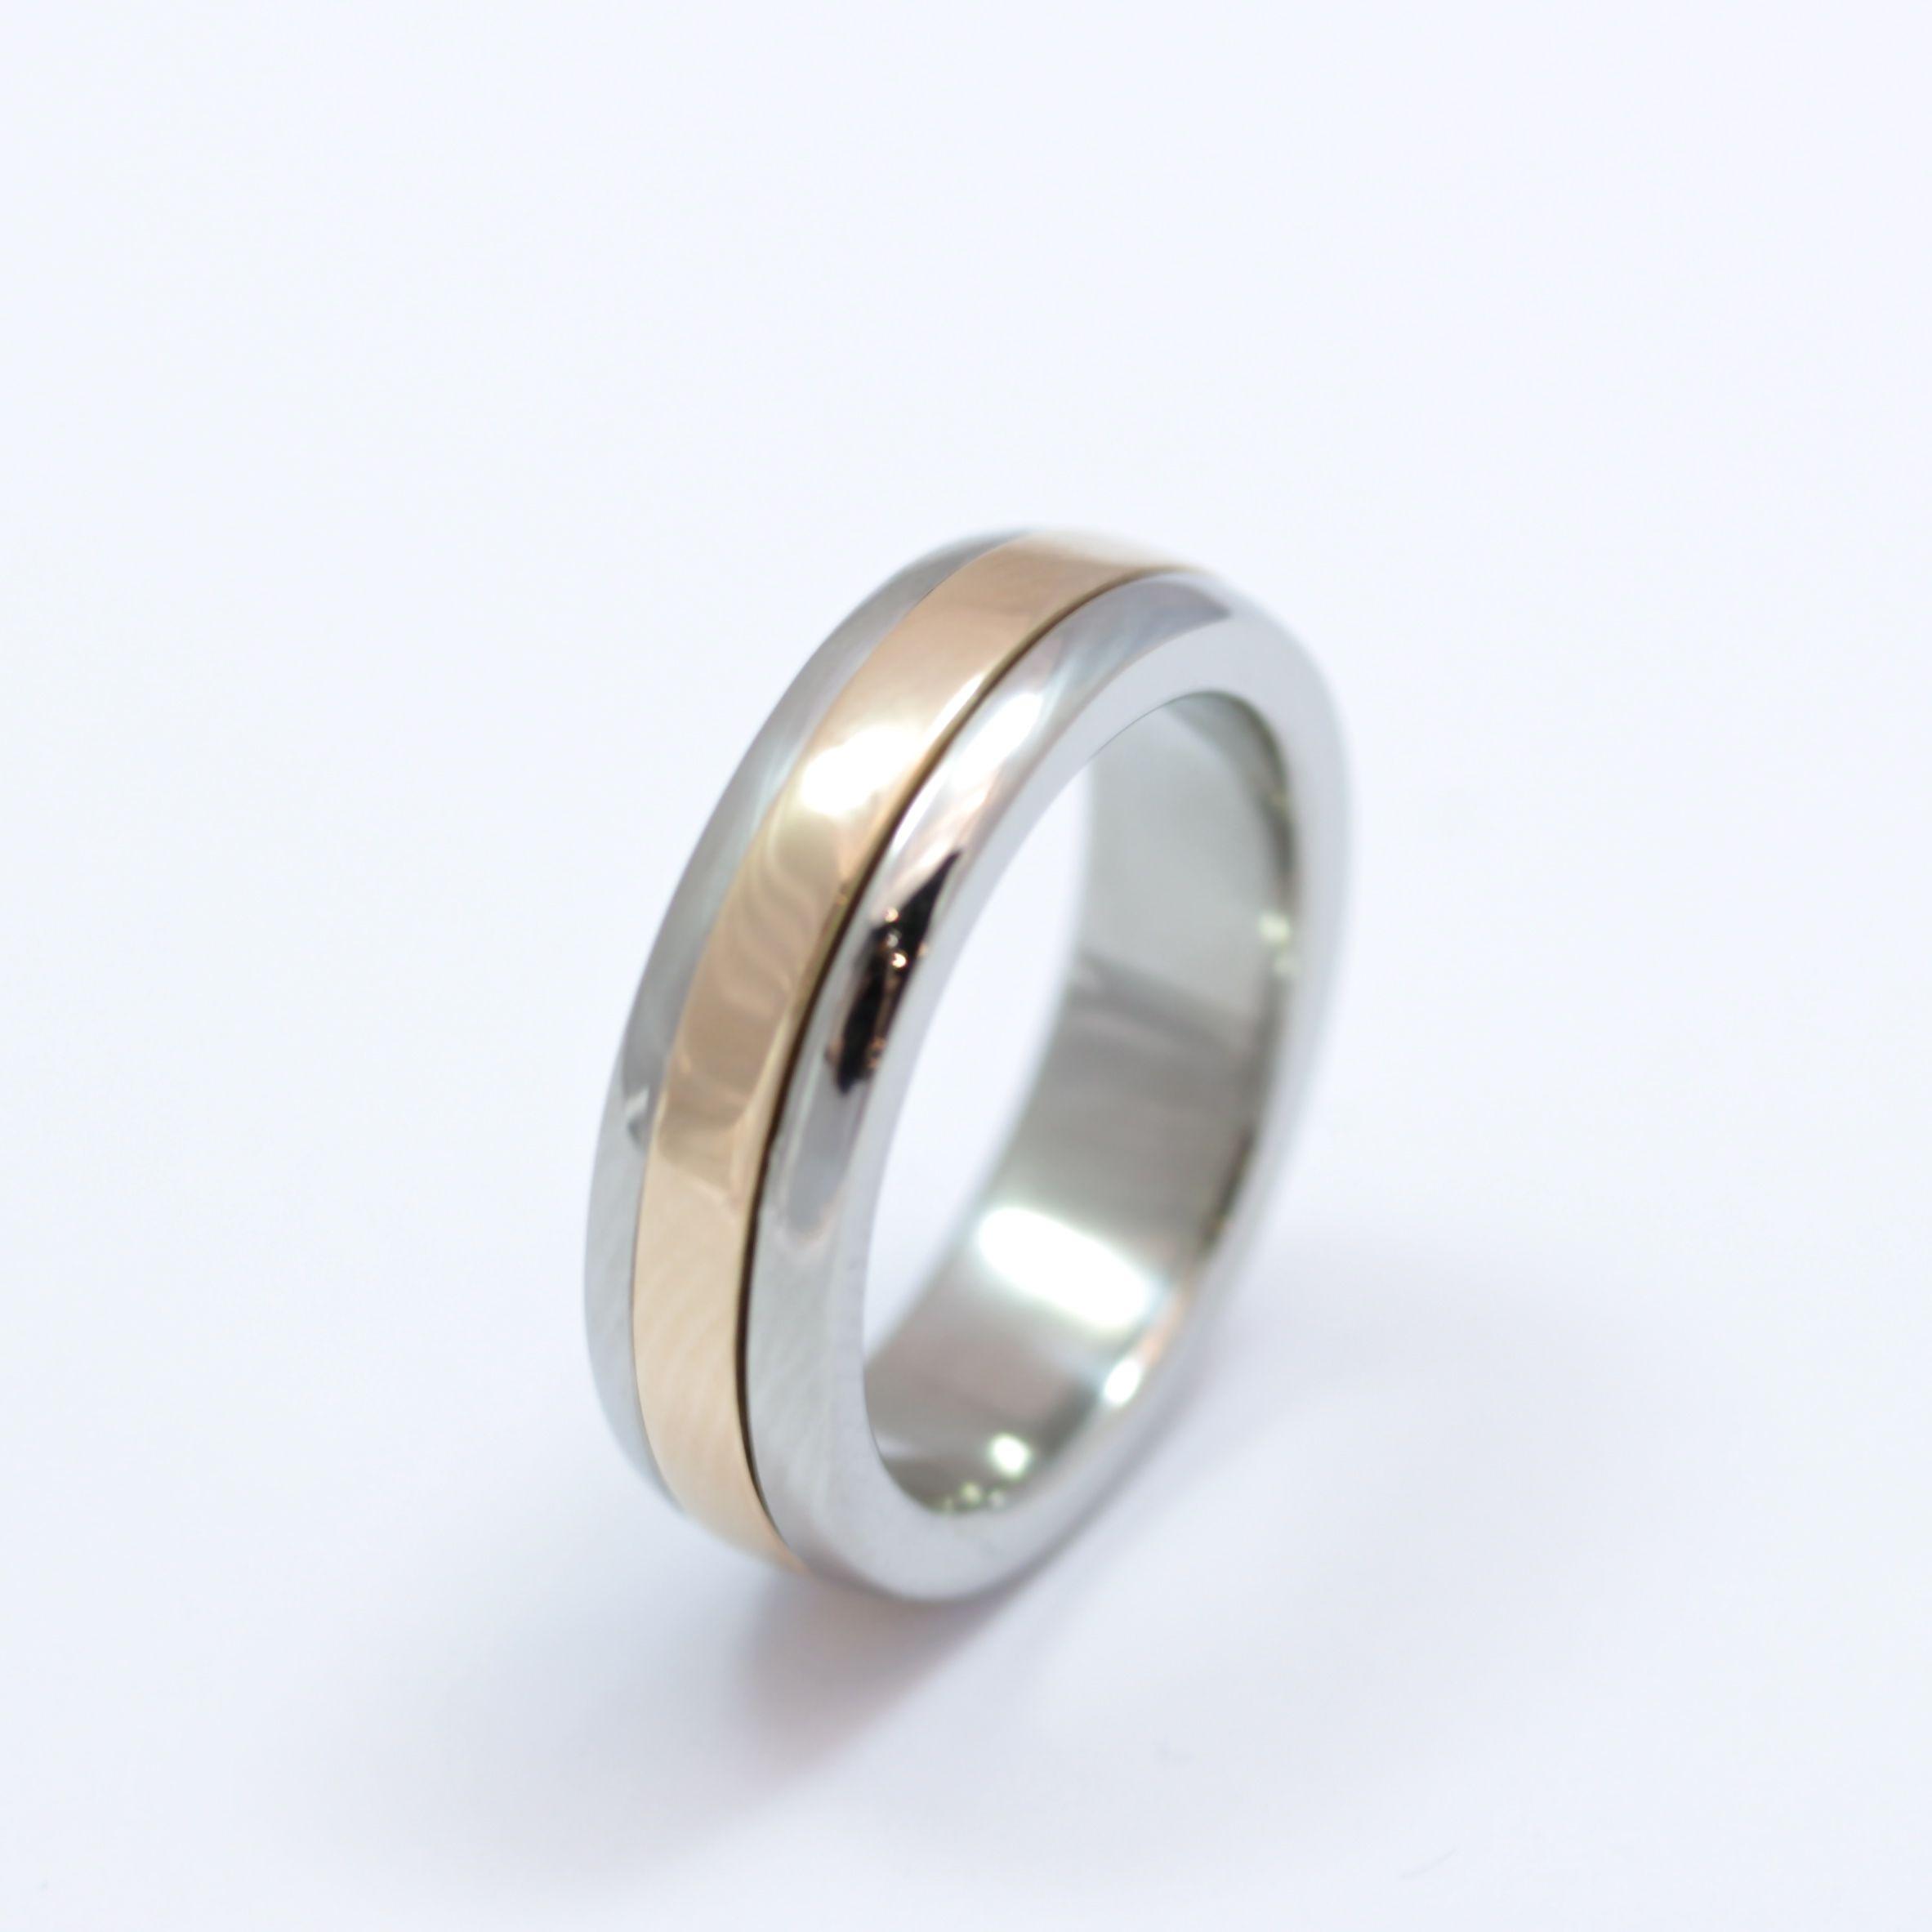 Ladies Palladium And Rose Gold Spinning Wedding Ring Wedding Rings Cork City Wedding Rings Palladium Wedding Ring Rings